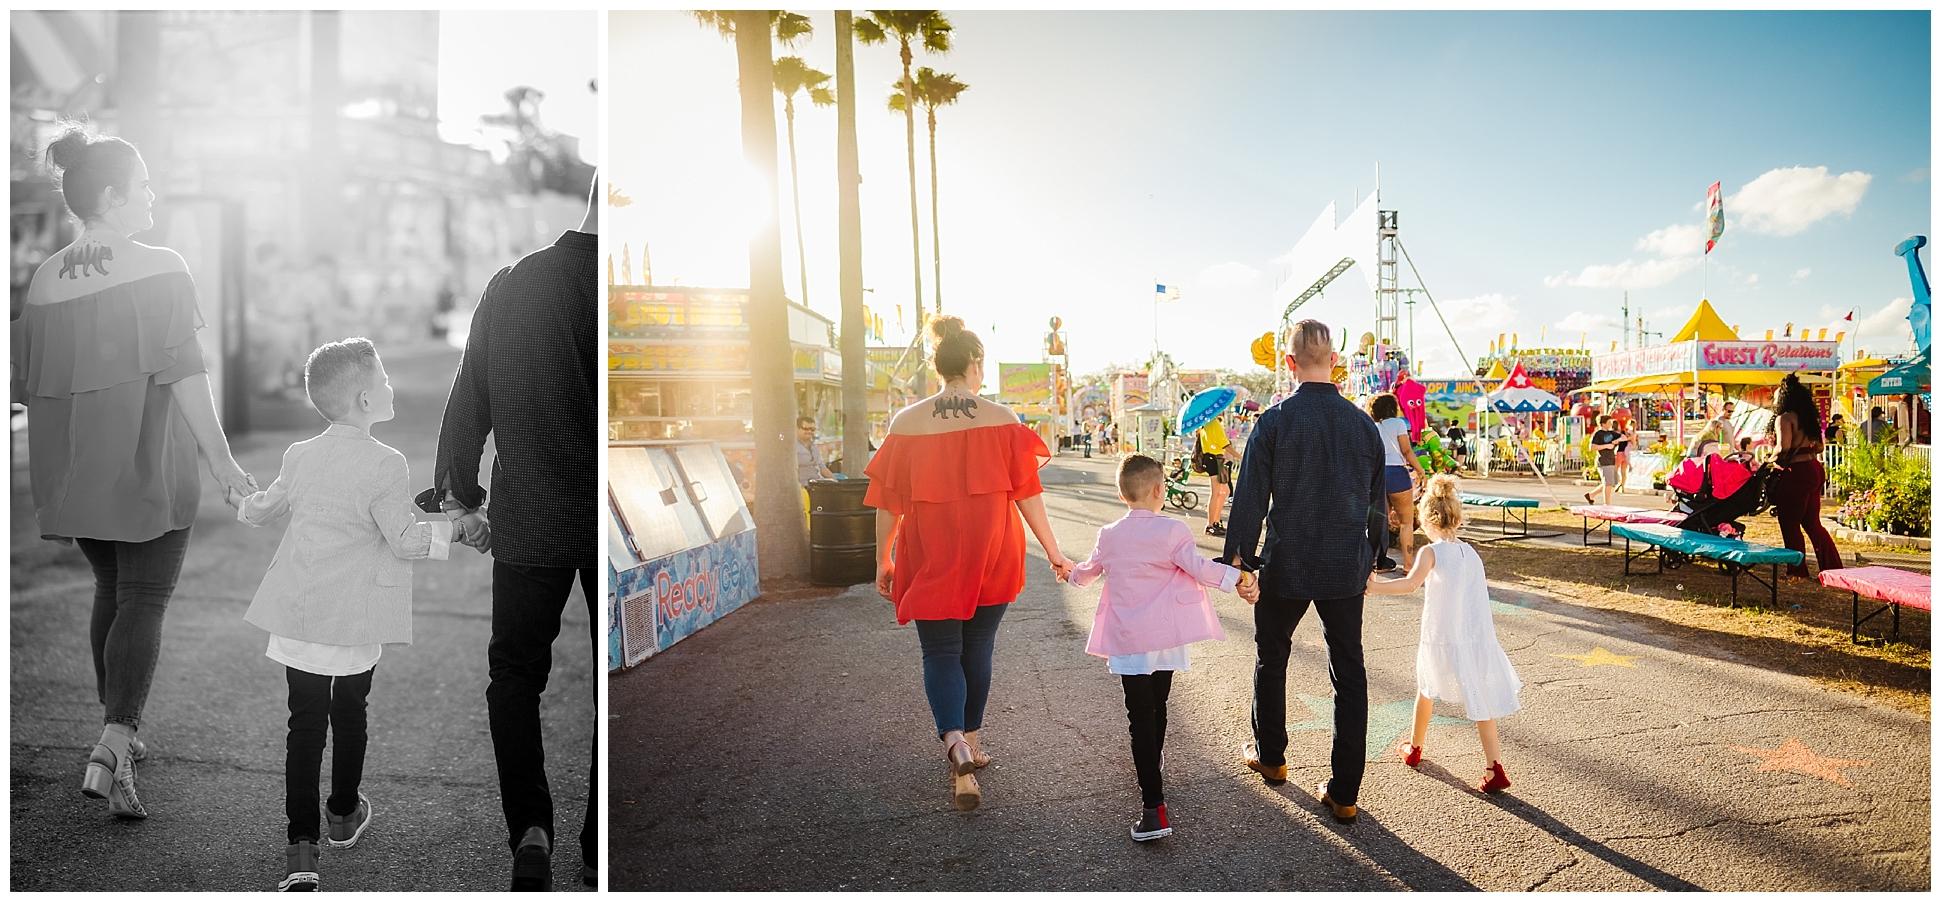 Tampa-colorful-fair-amusement park-family session_0003.jpg